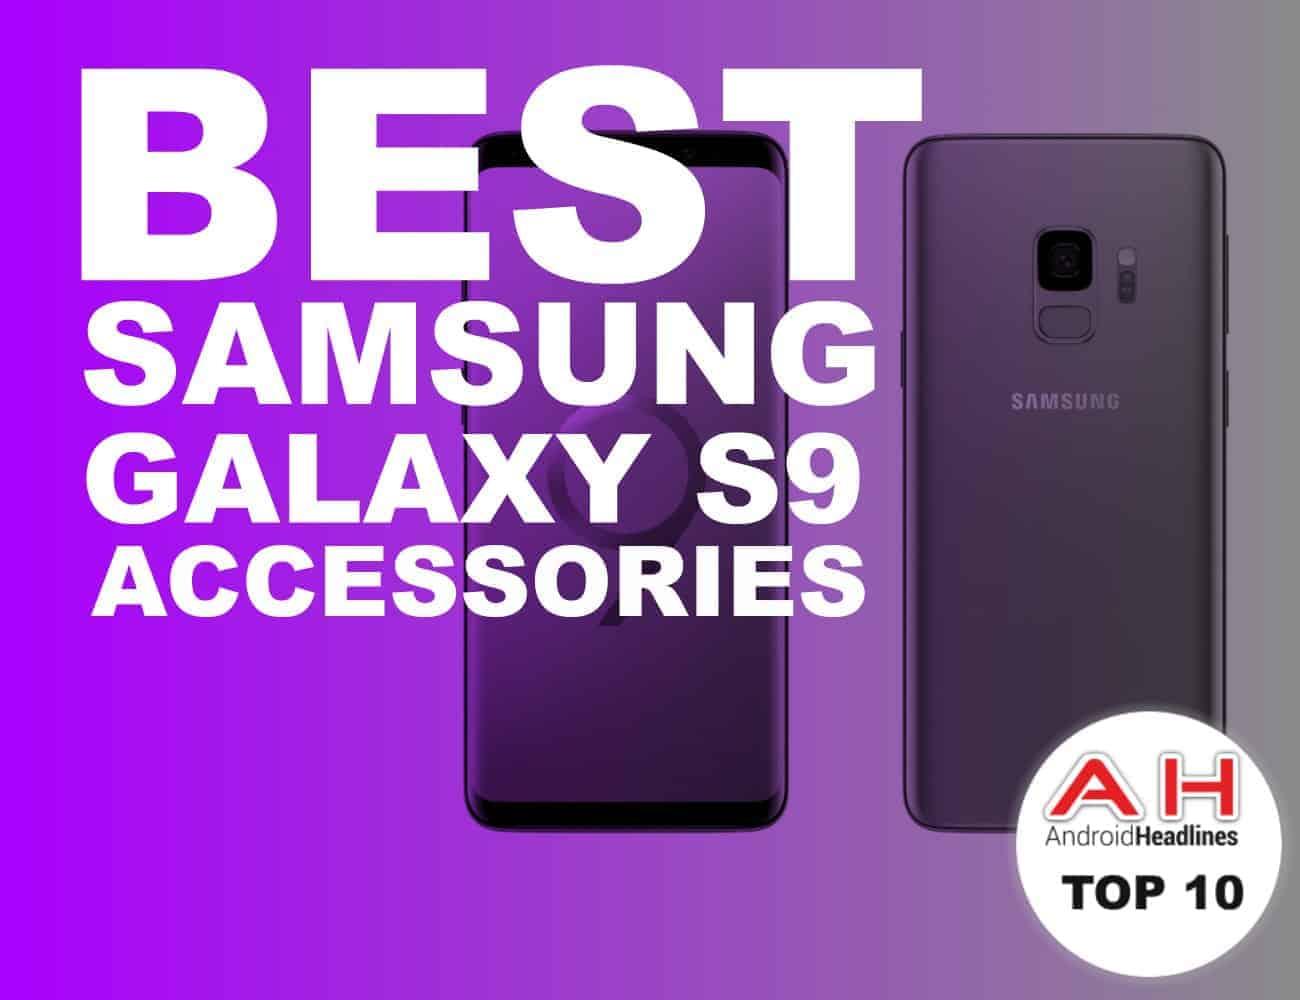 BEST SAMSUNG GALAXY S9 ACCESSORIES FEB AH